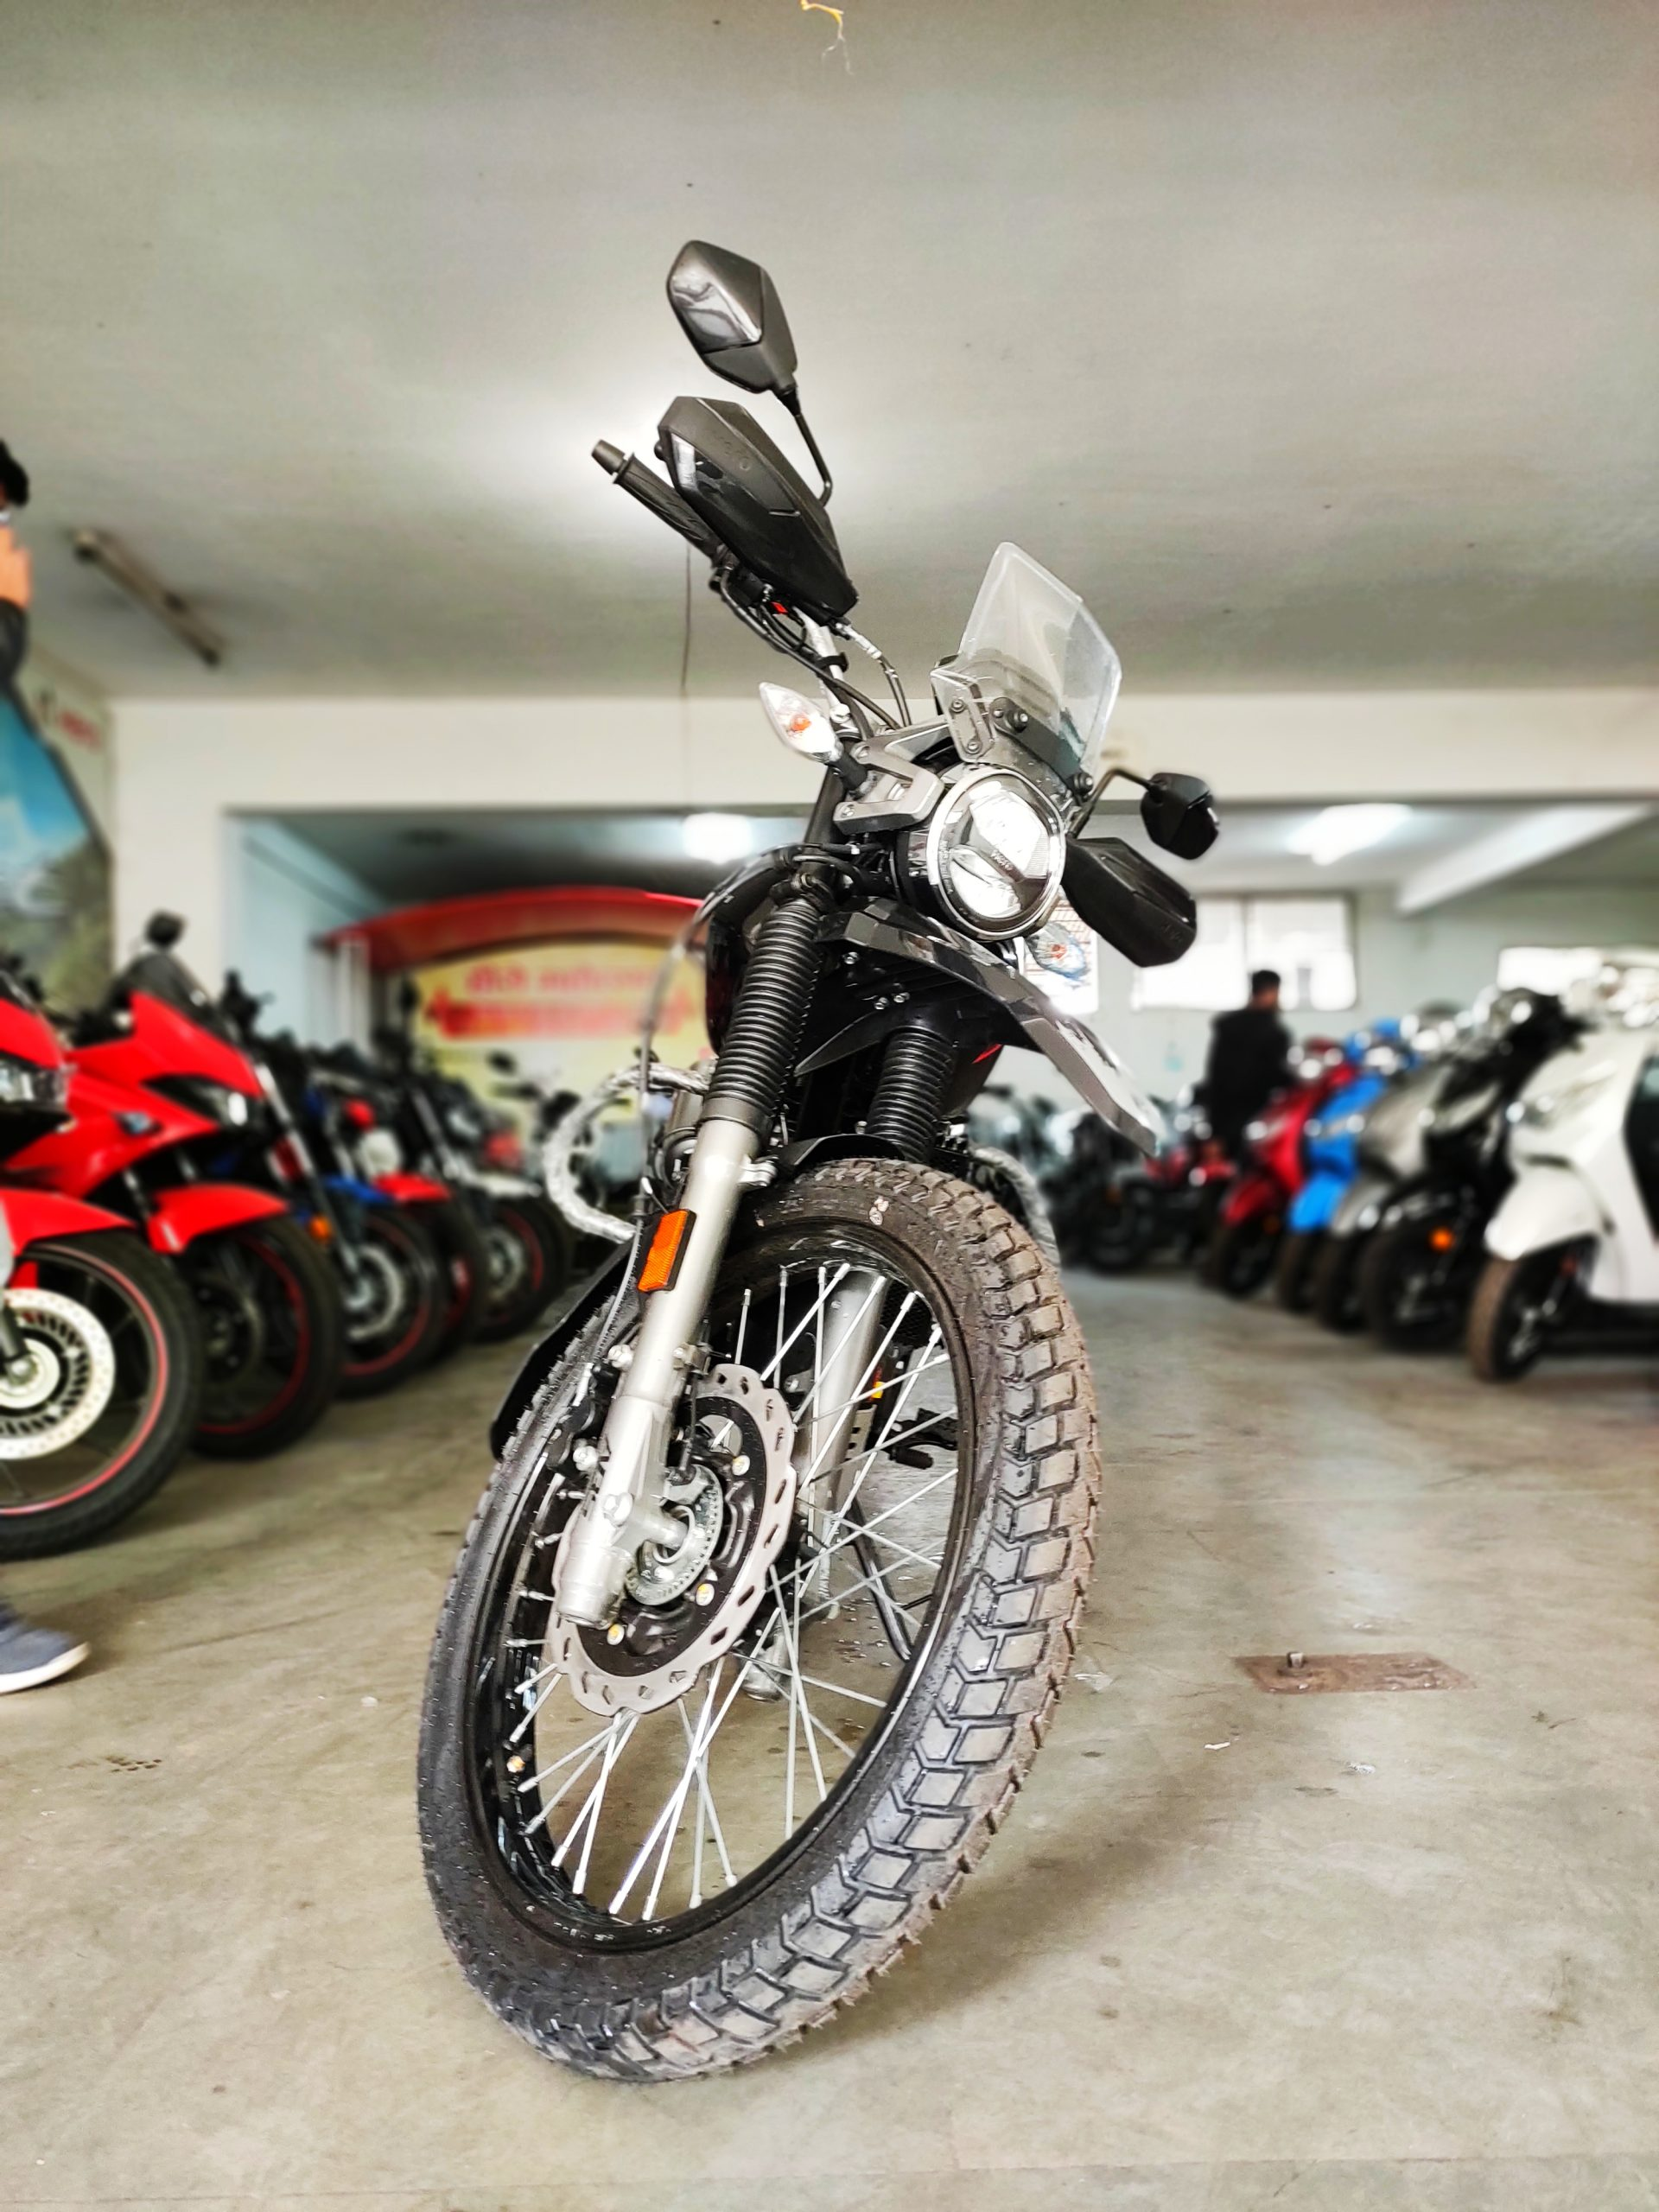 An adventures bike in the bike show room